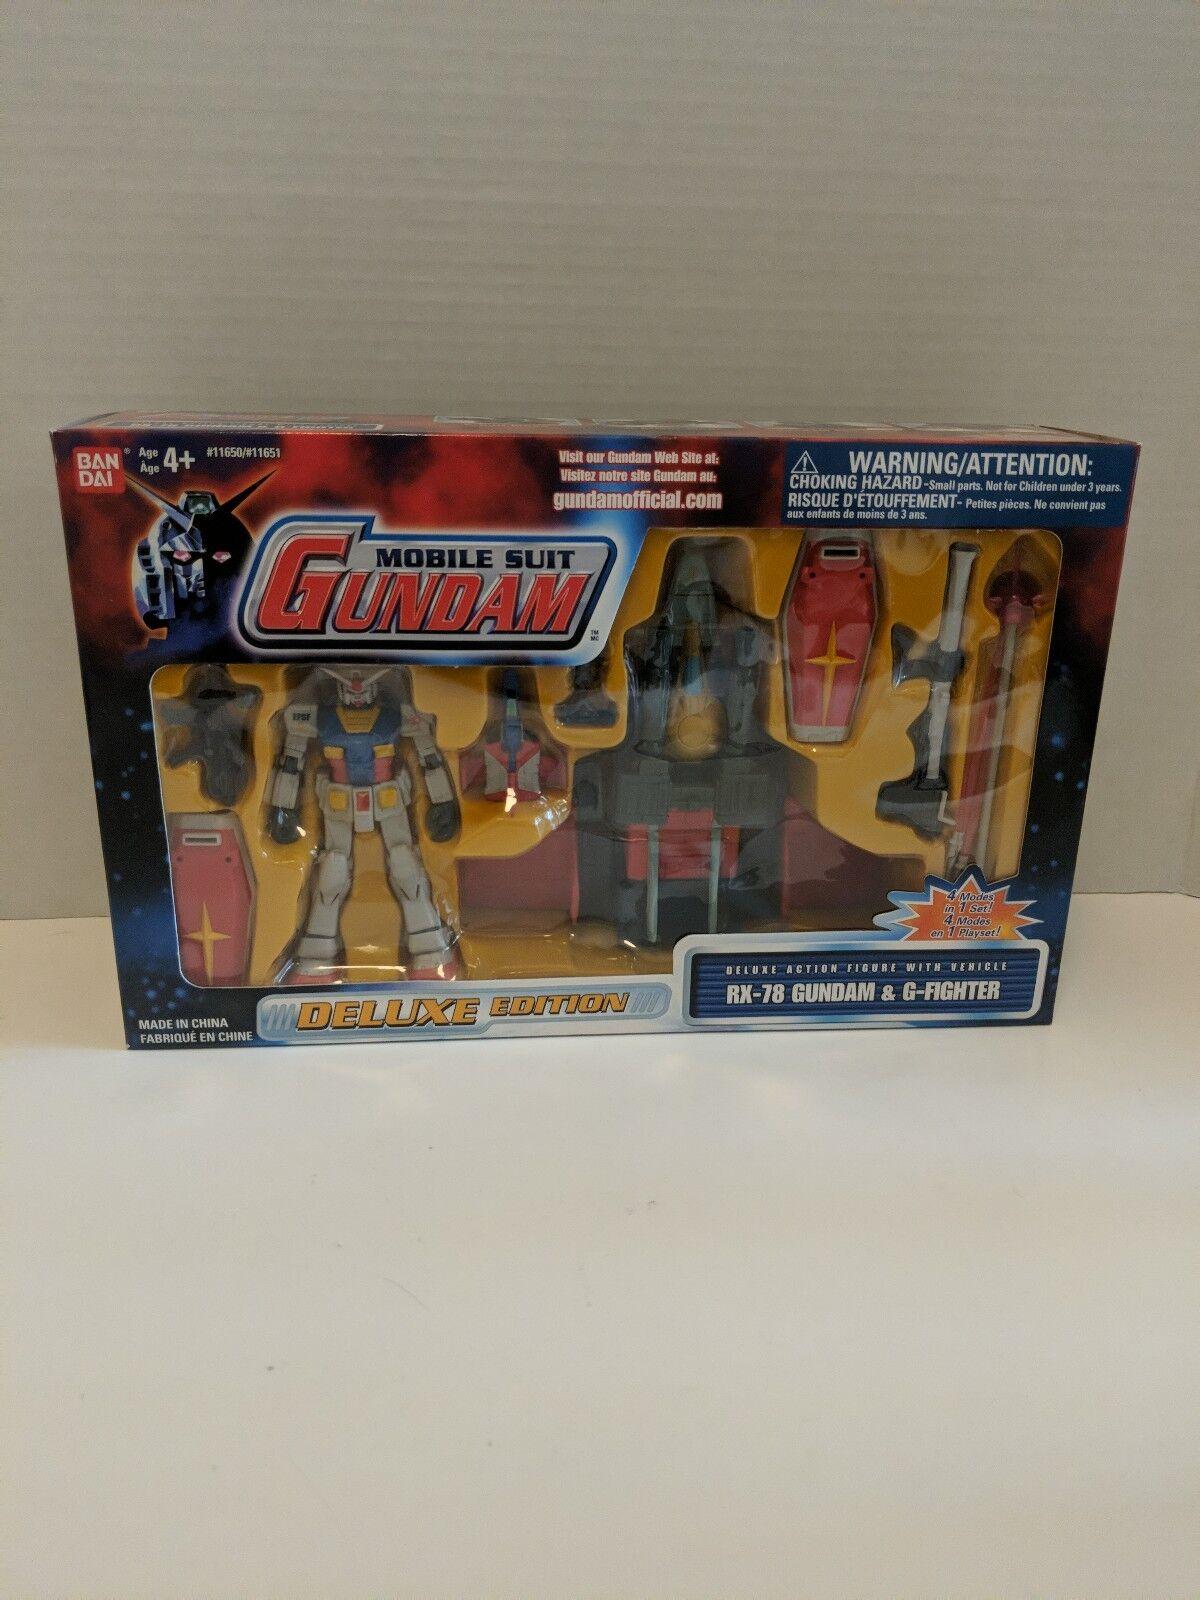 Mobile Suit Gundam Bandai RX-78 Gundam & G-fighter 2001 NIB Deluxe Edition